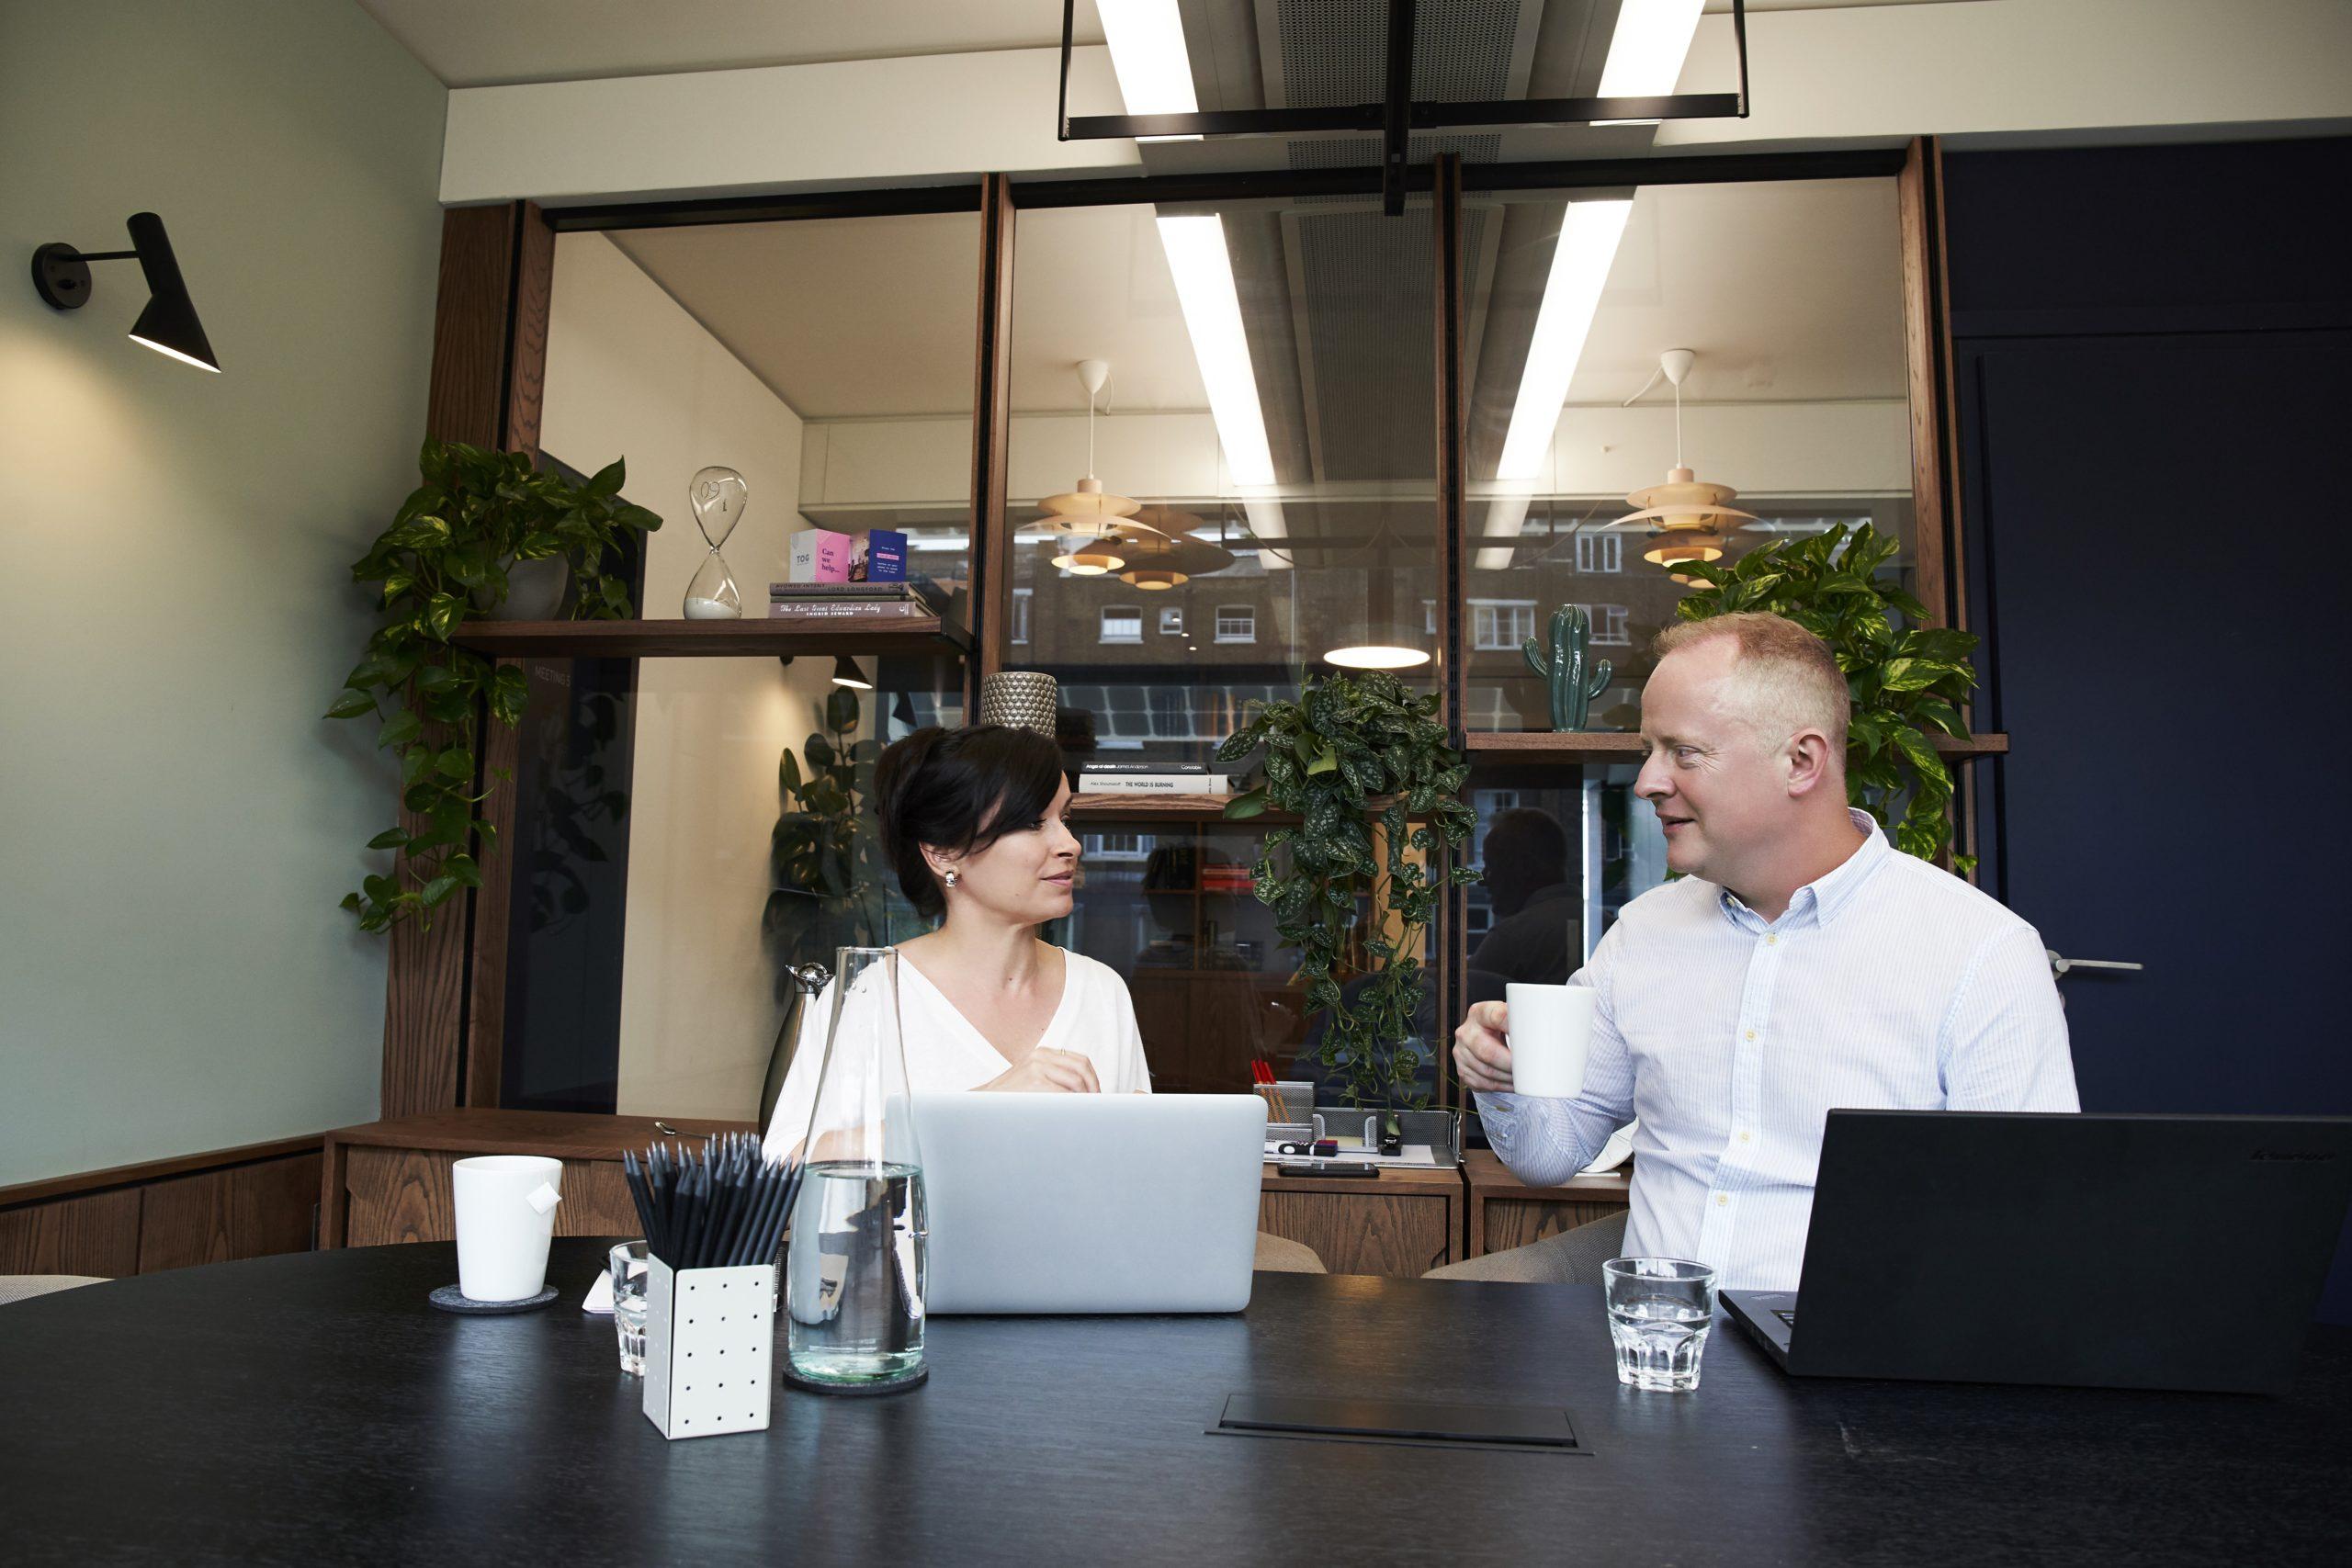 Introducing Mentor Exchange Executive Coaching